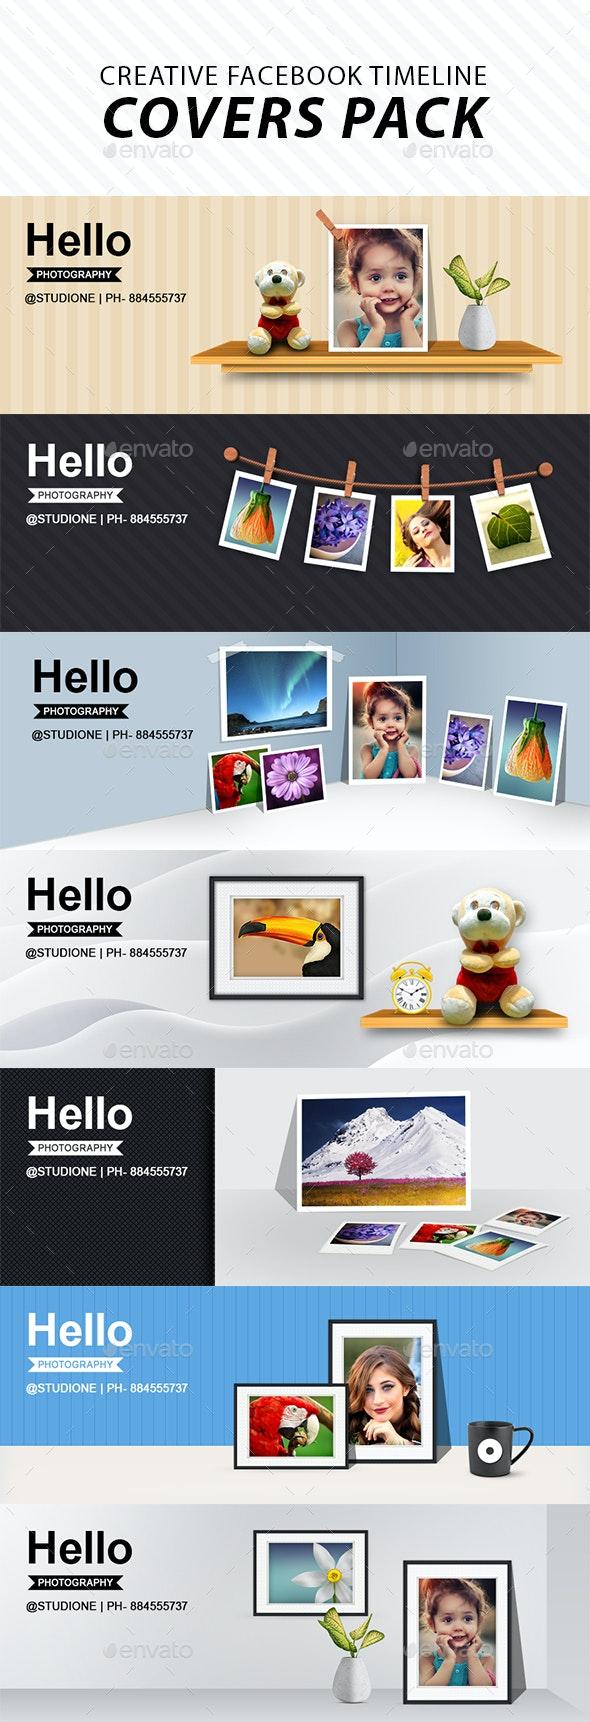 Creative Facebook Timeline Covers Pack - Facebook Timeline Covers Social Media